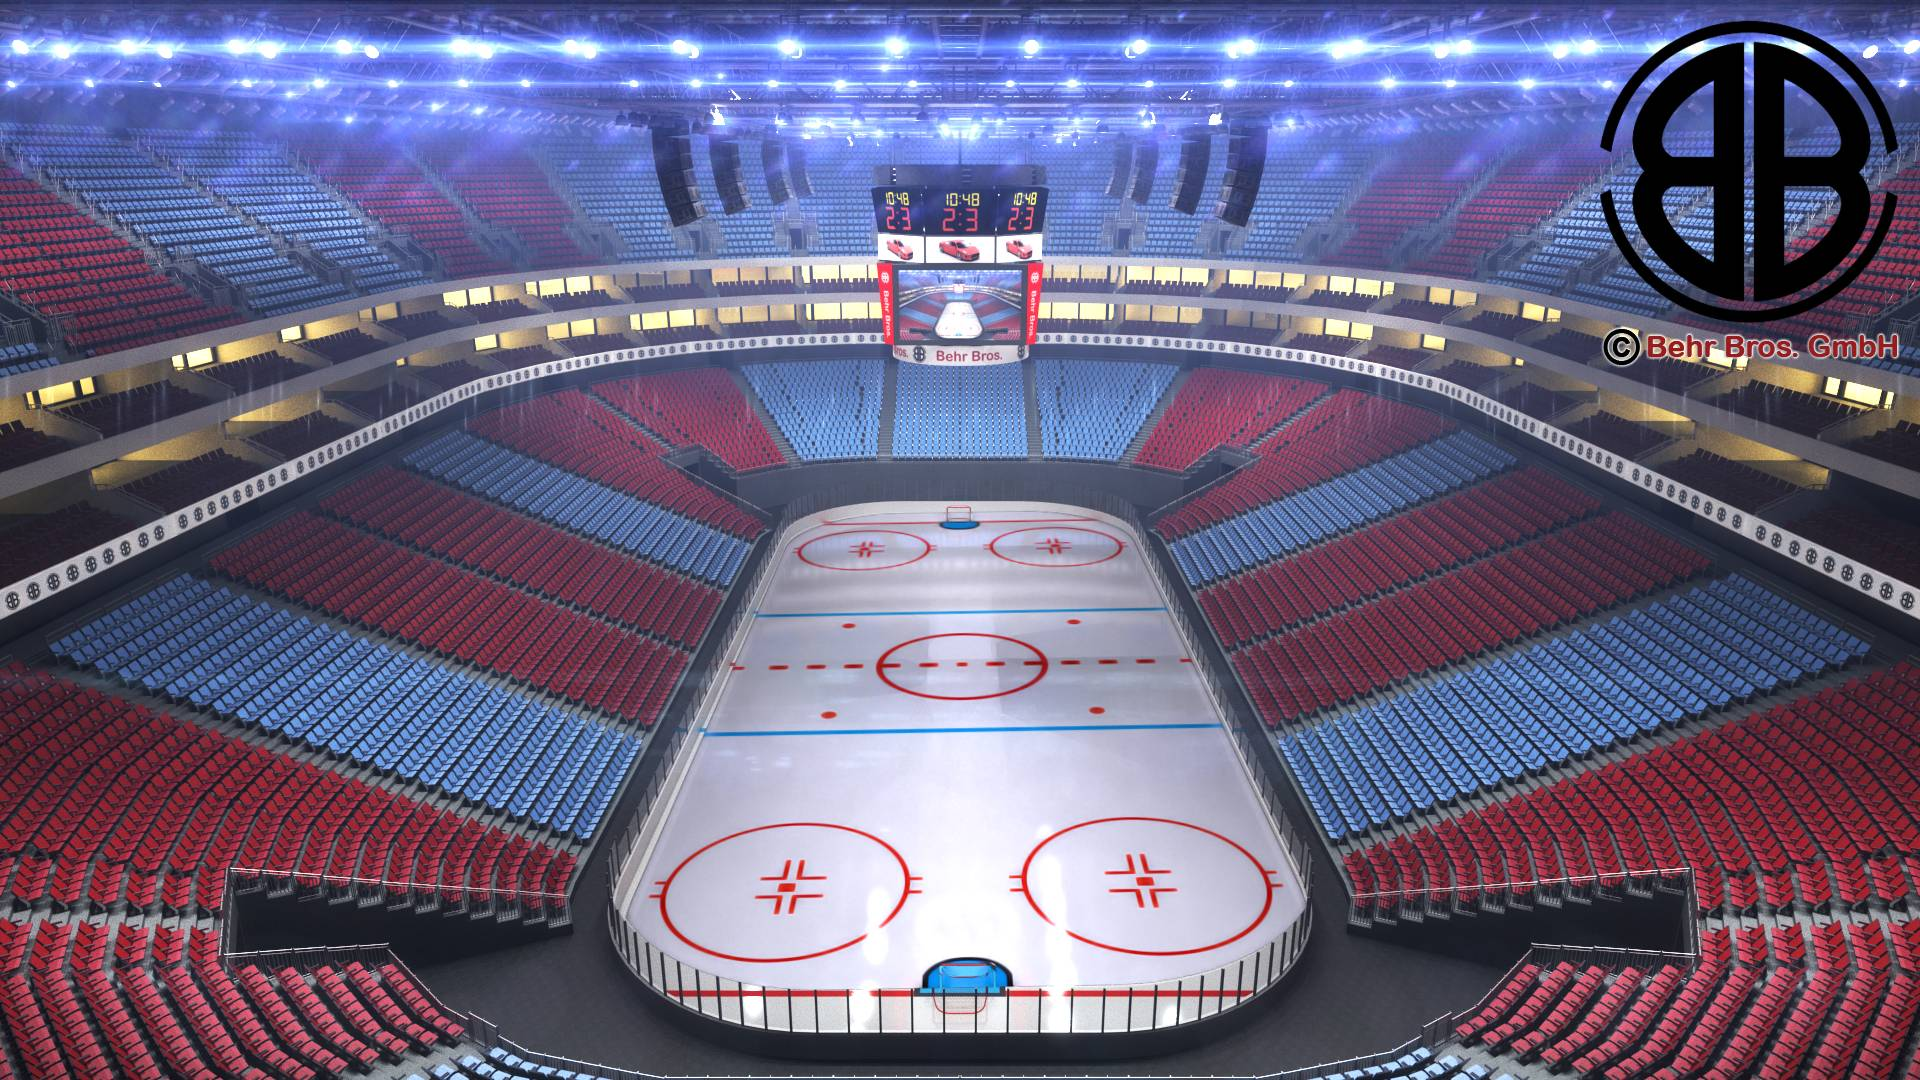 Ice Hockey Arena V2 3d model 3ds max fbx c4d lwo lws lw ma mb obj 251652